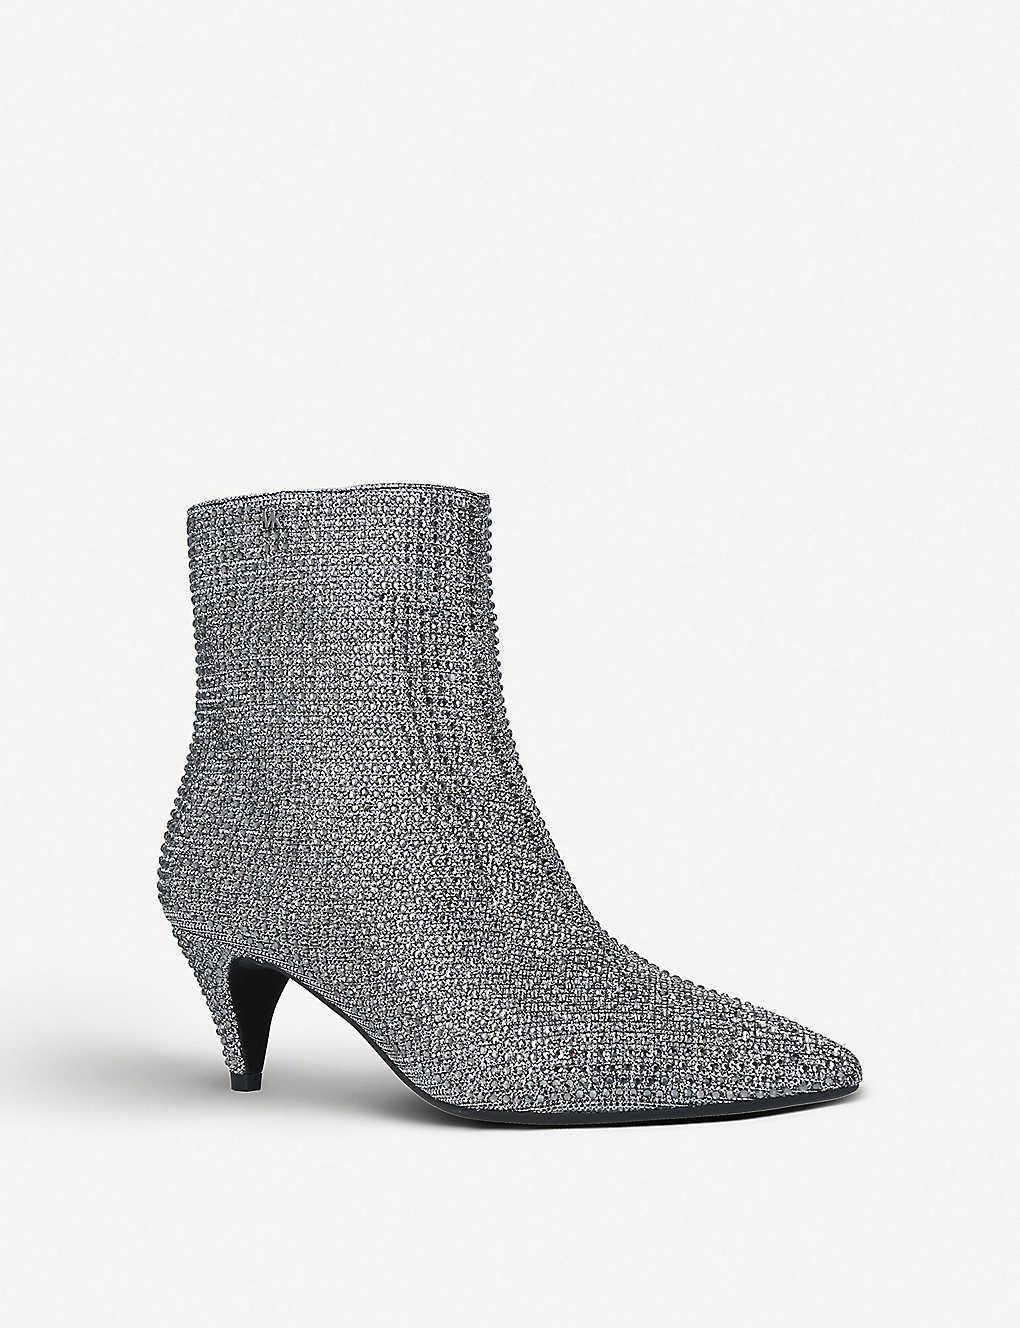 b7a64fb086c8 MICHAEL MICHAEL KORS - Blaine metallic boots